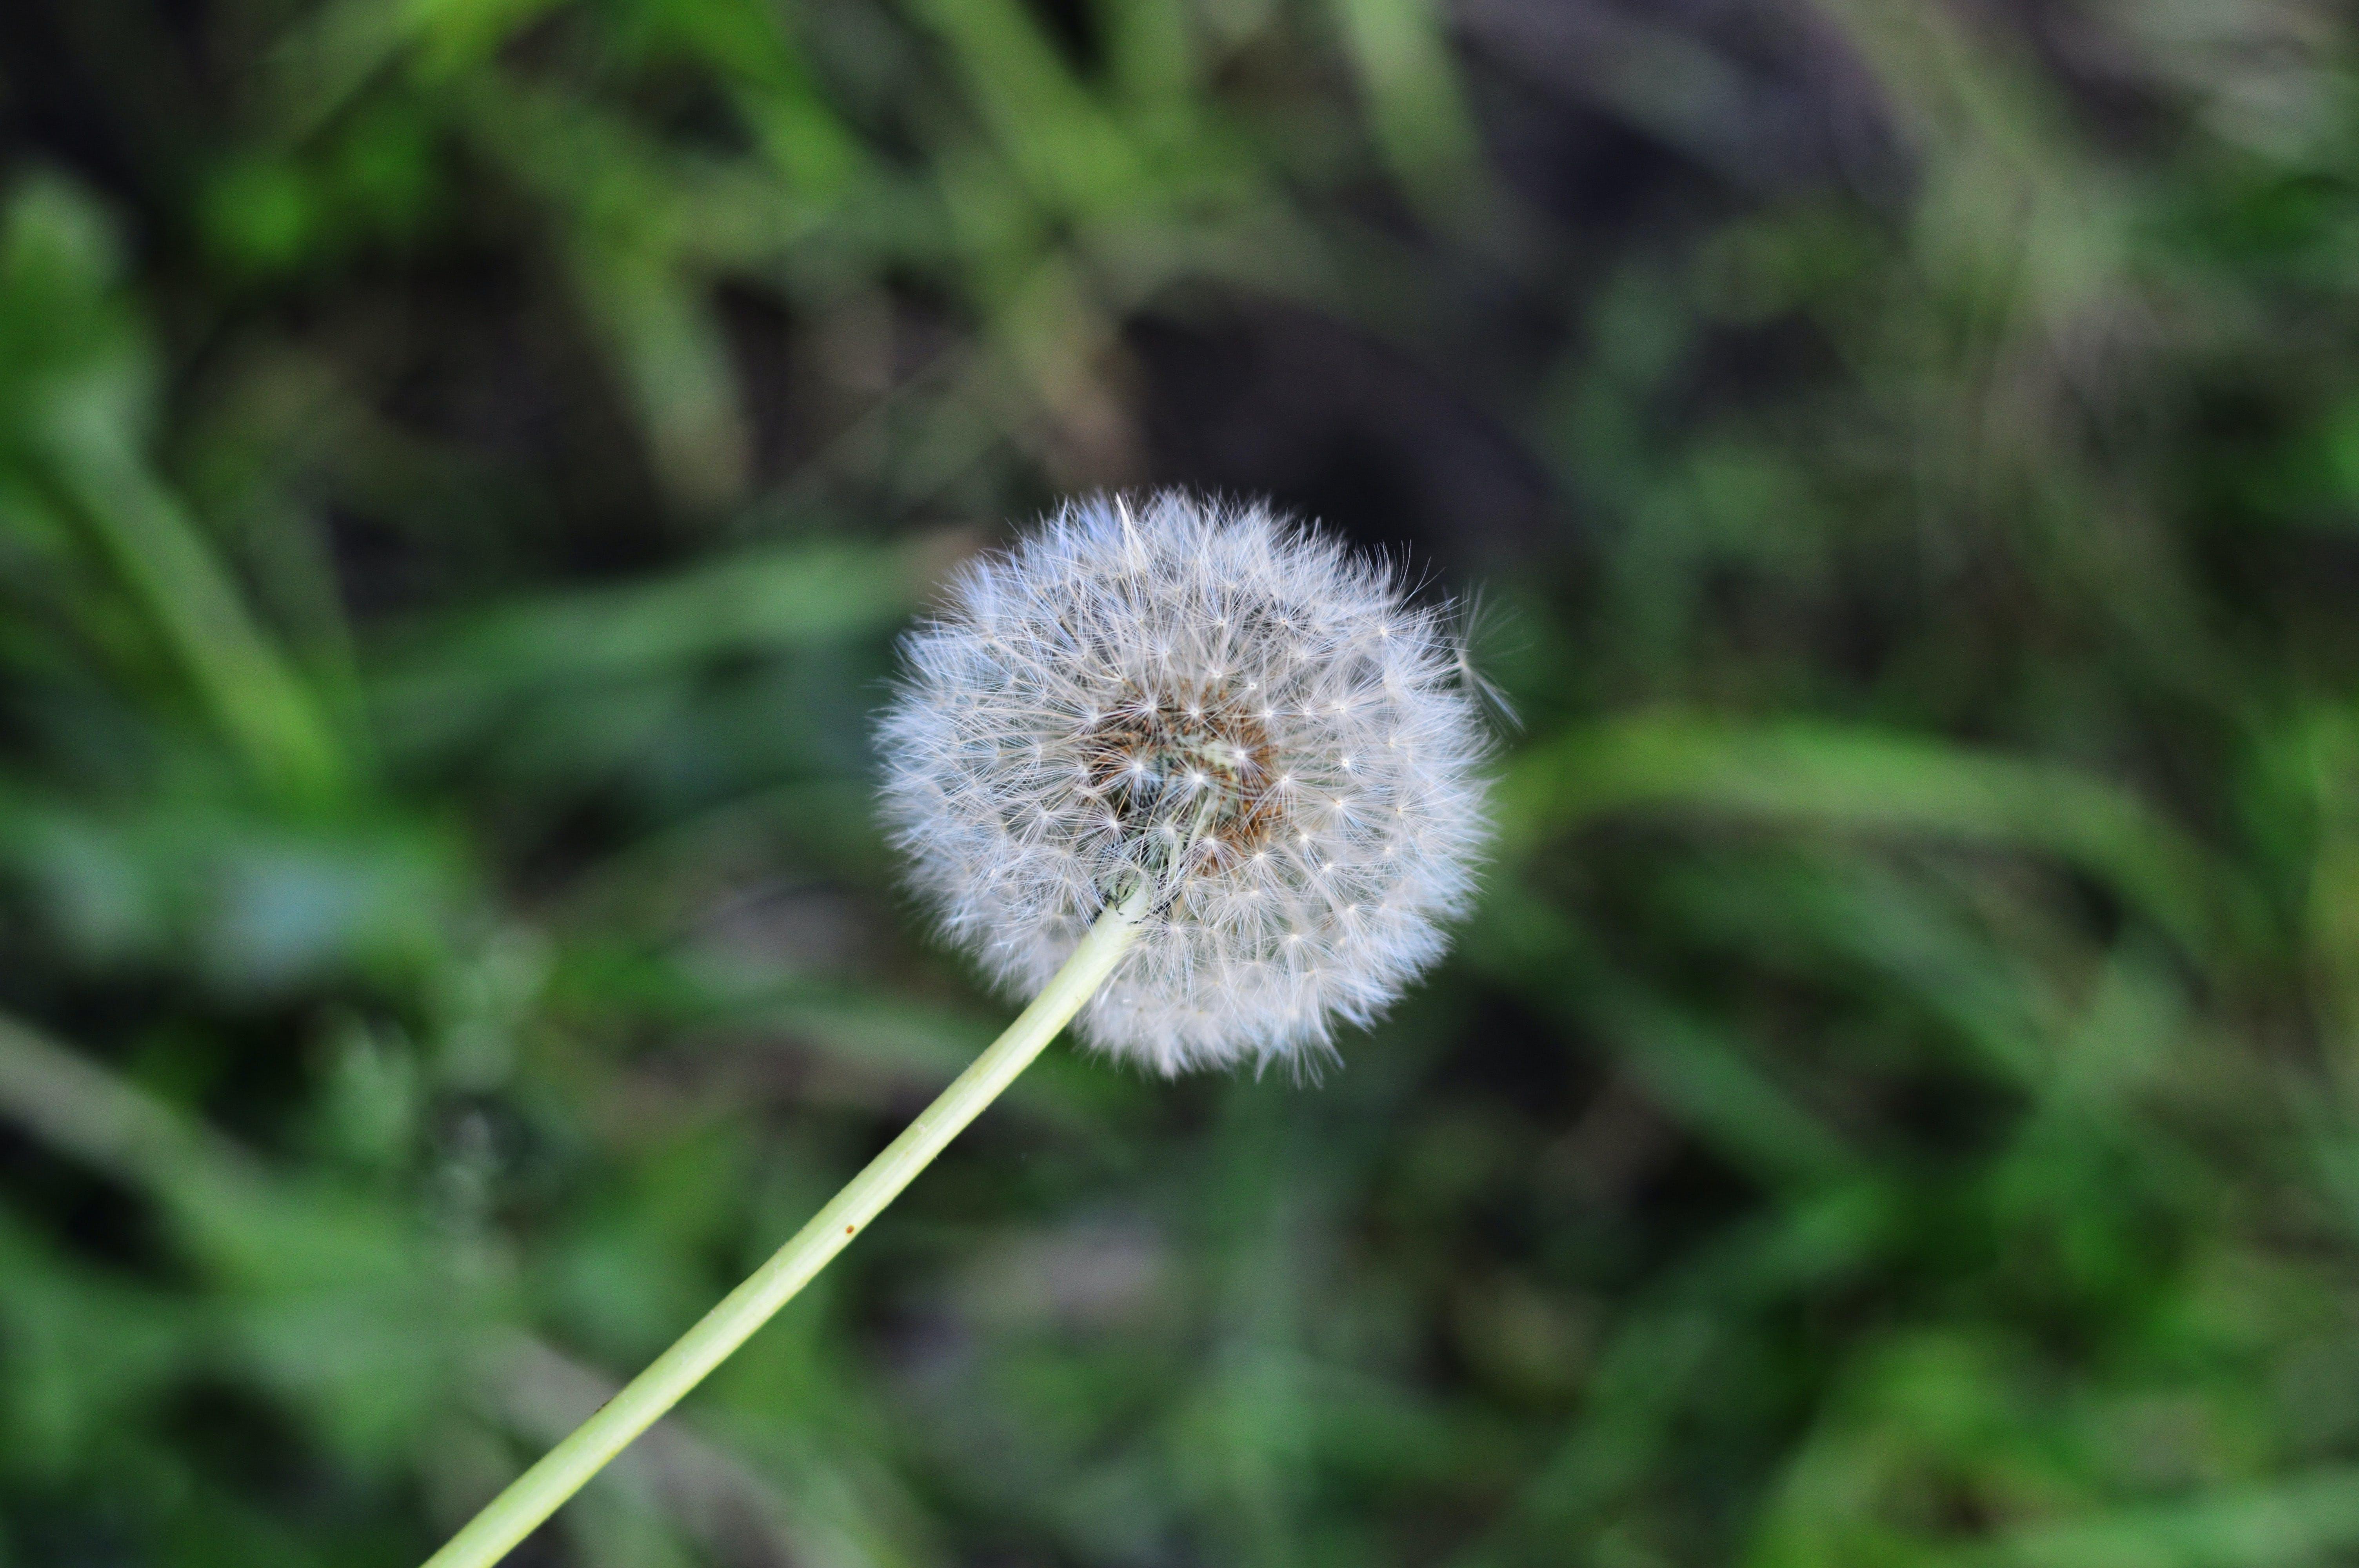 Free stock photo of beauty, closeup, dandelion, dandelion seed